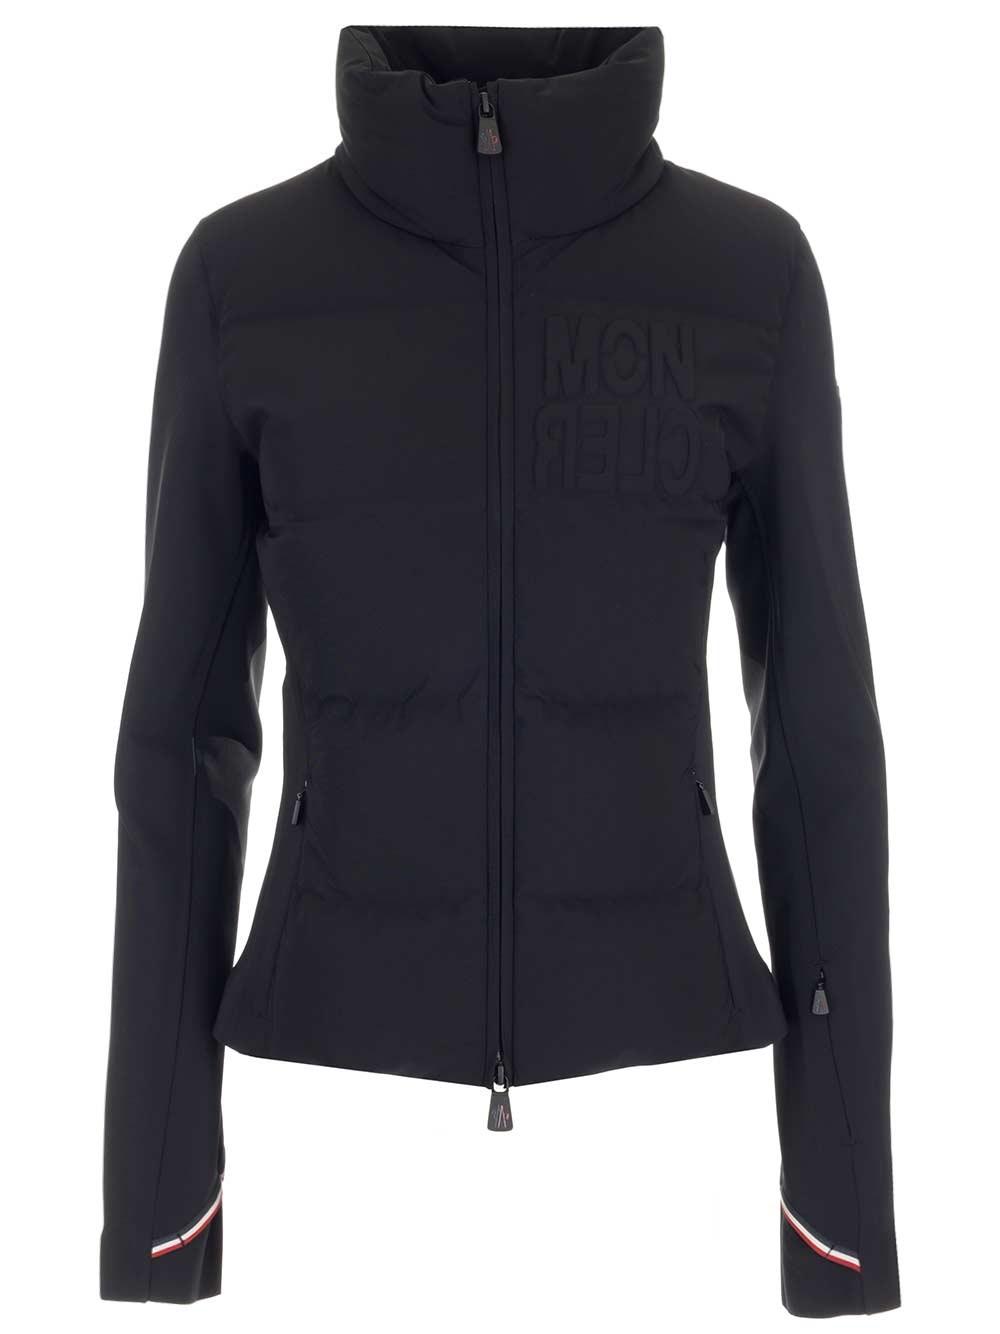 MONCLER GRENOBLE Stretch Jersey Zipper Jacket